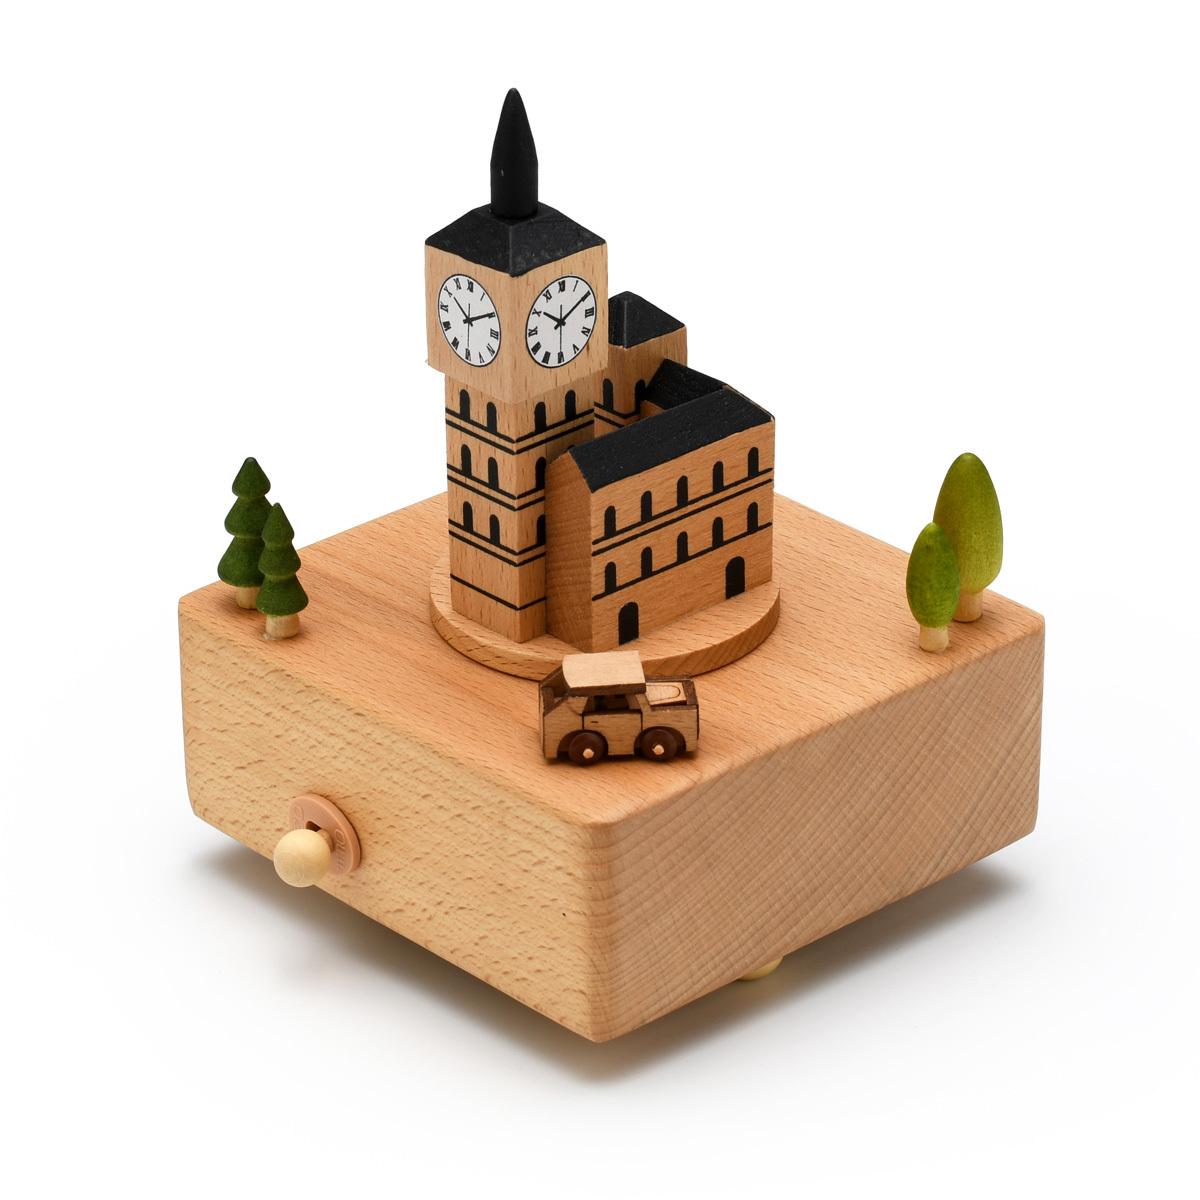 Animated 18 Note Musical Wooden Big Ben Clock Tower Keepsake